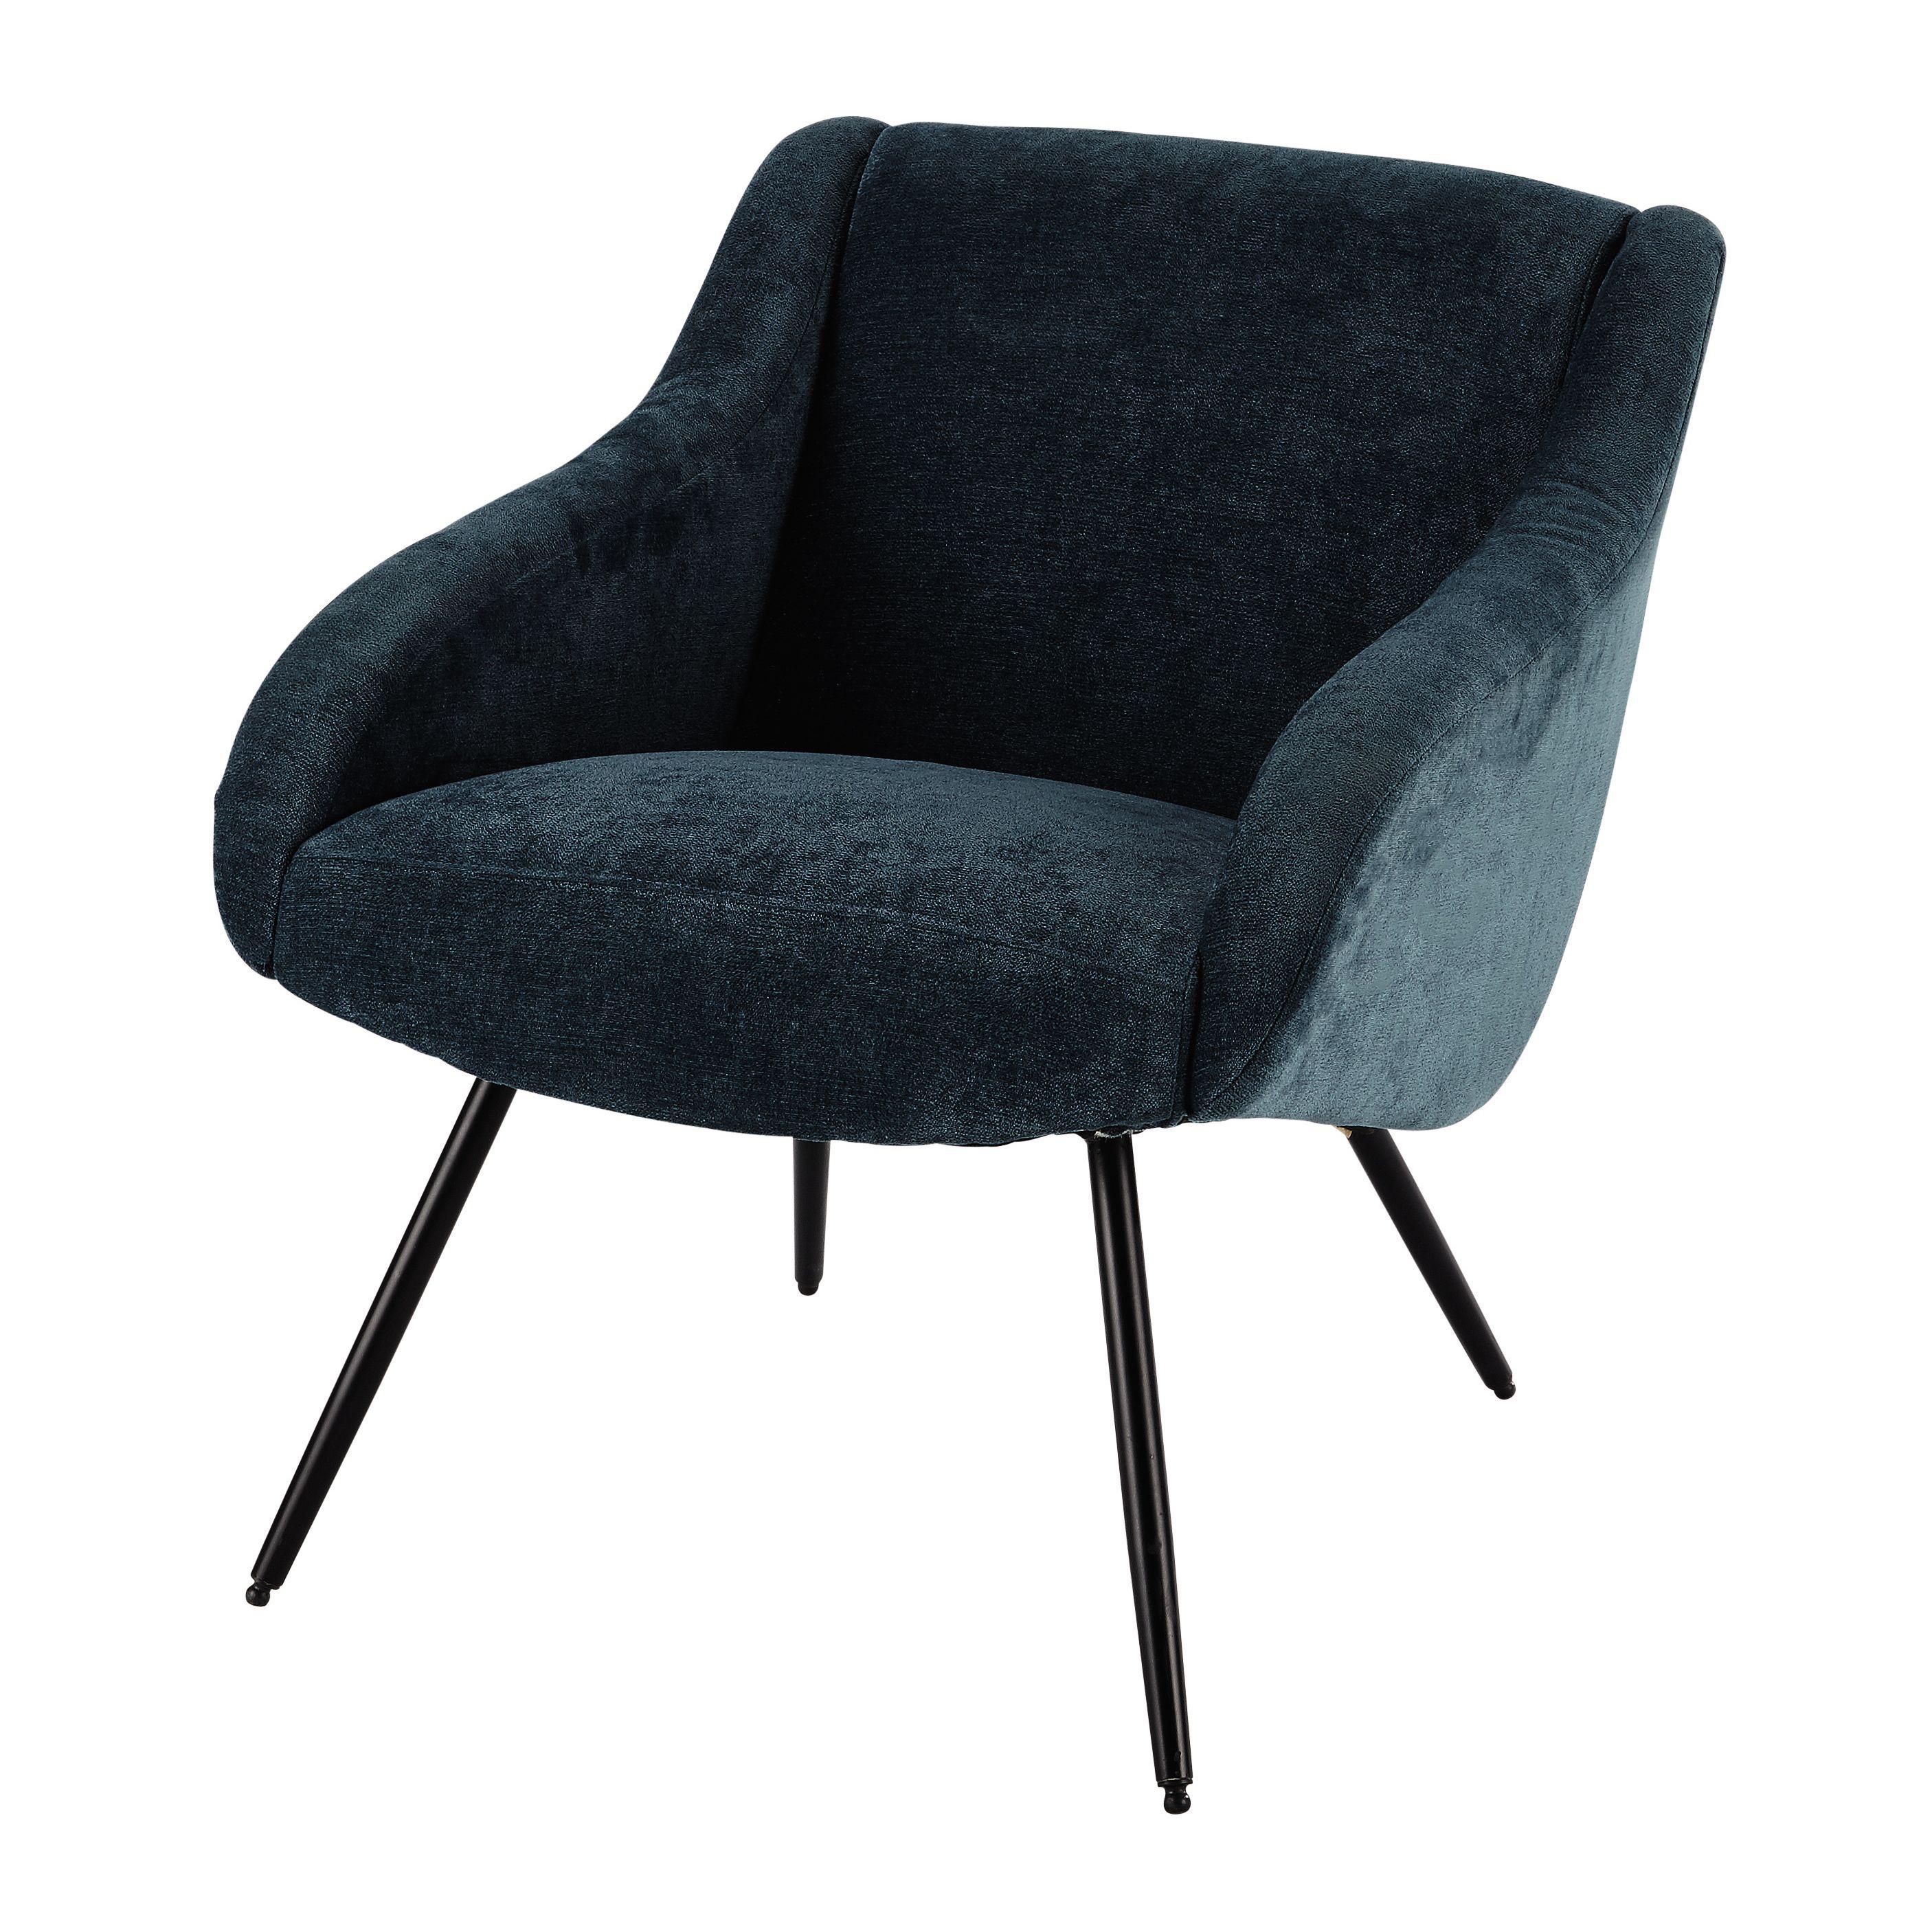 sessel aus velours im vintage stil blau und metall sessel i chairs pinterest. Black Bedroom Furniture Sets. Home Design Ideas